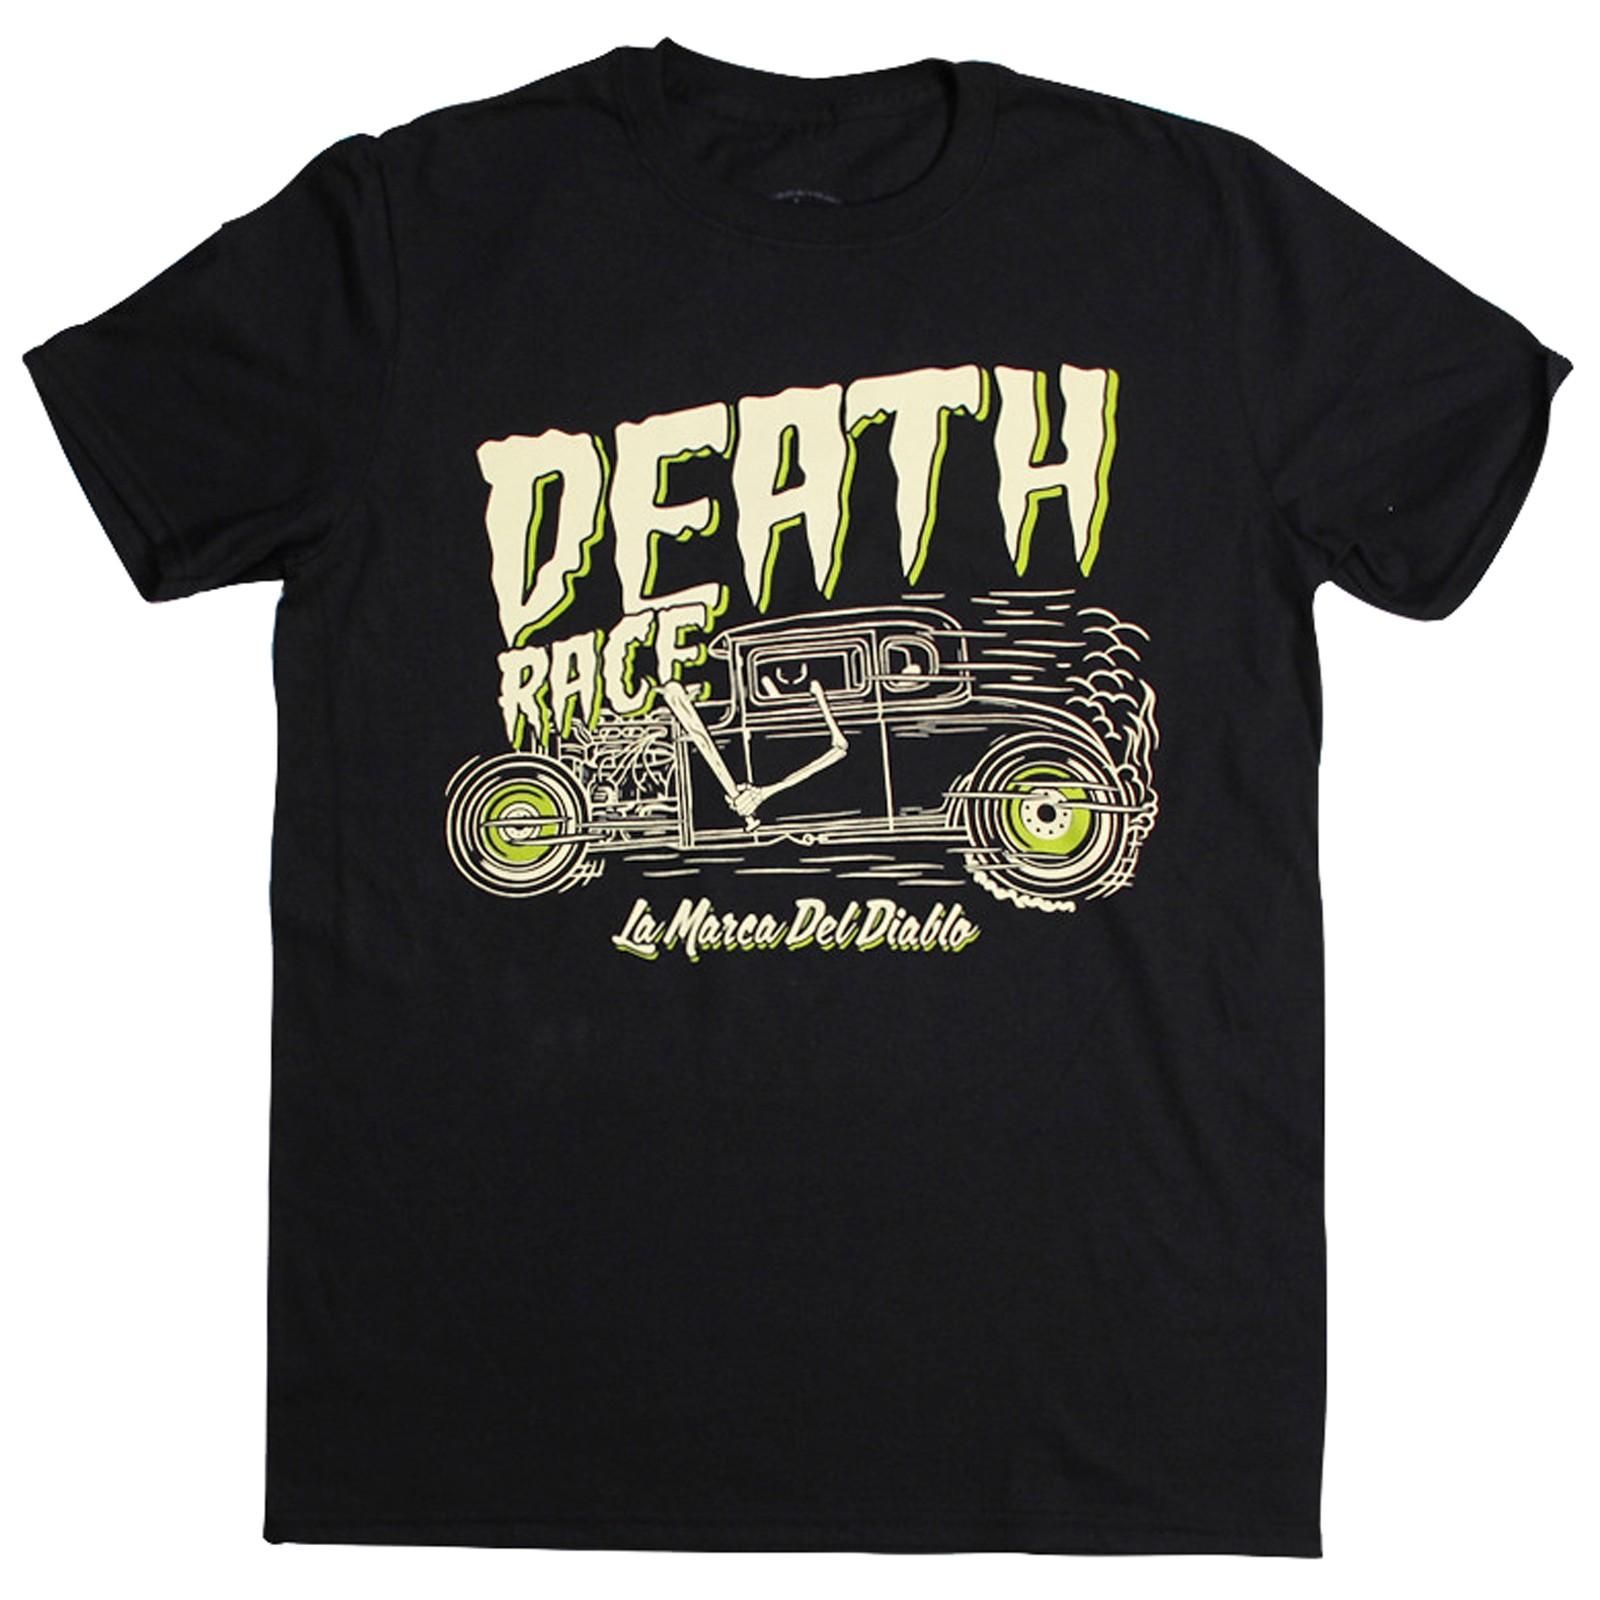 La Marca Del Diablo - Death Race T-Shirt